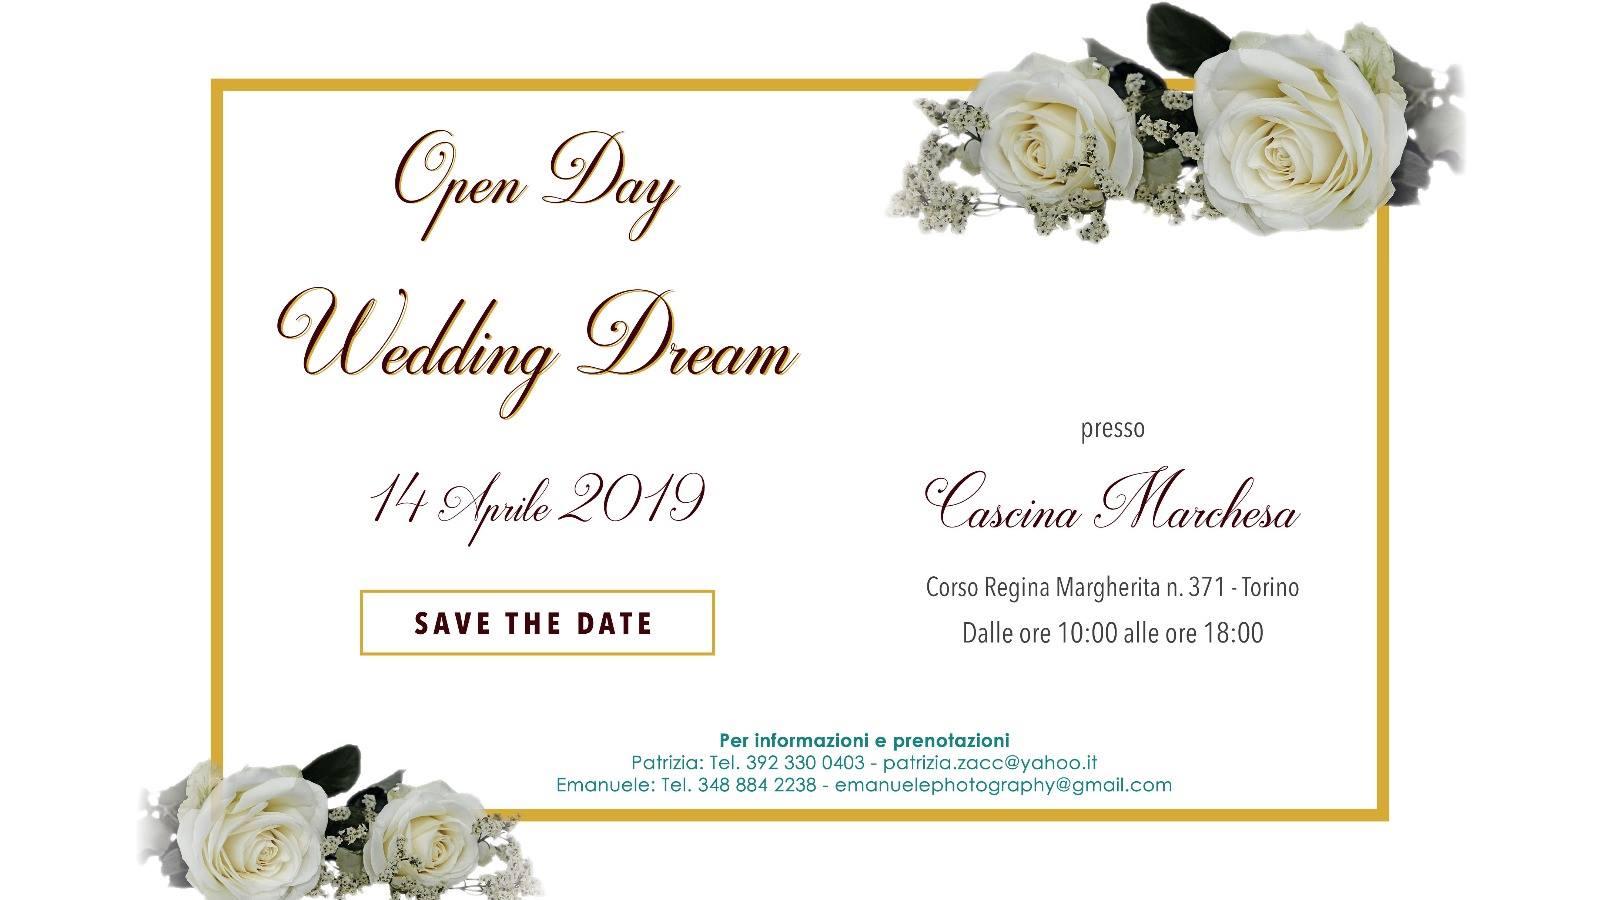 Open Day-Wedding Dream События Турина апрель 2019 года